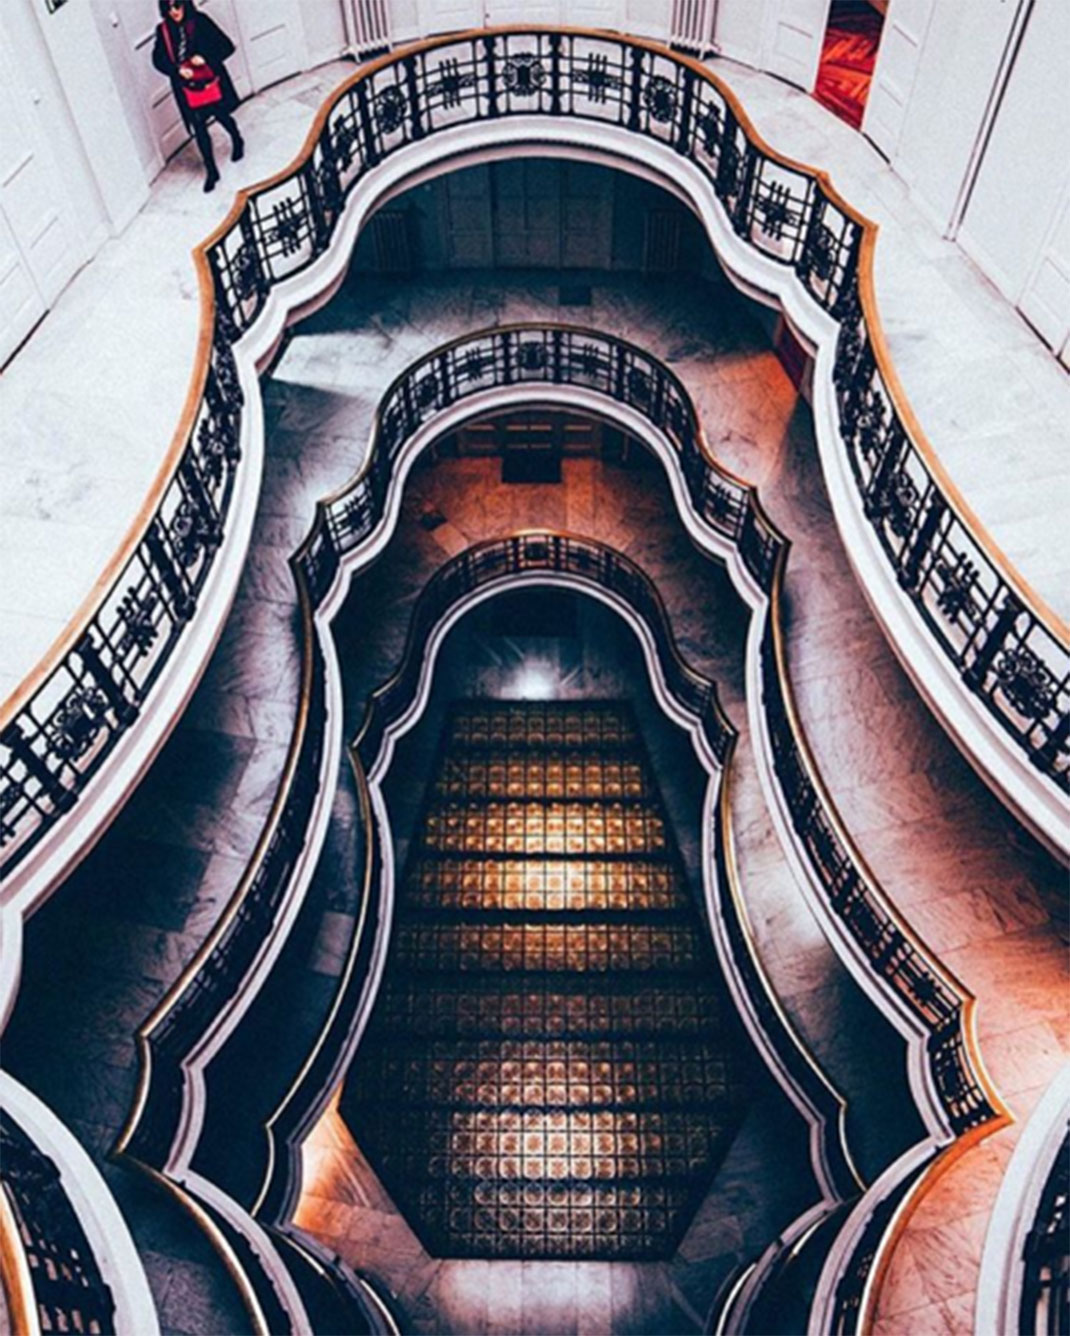 6-architecture-symetrie